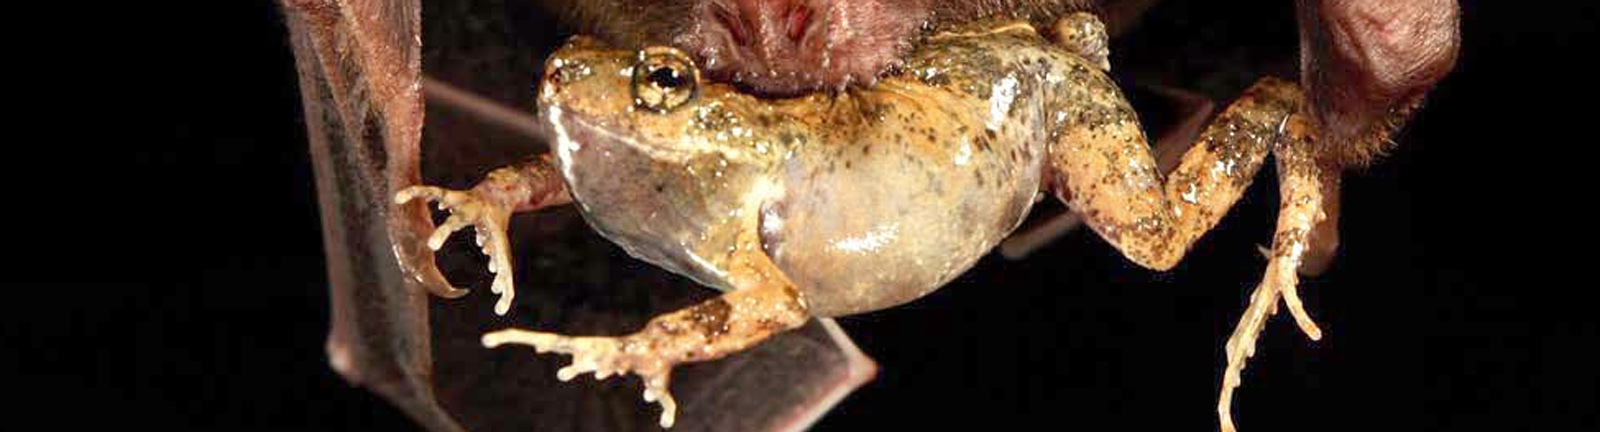 Fledermaus frisst Tungara-Frosch